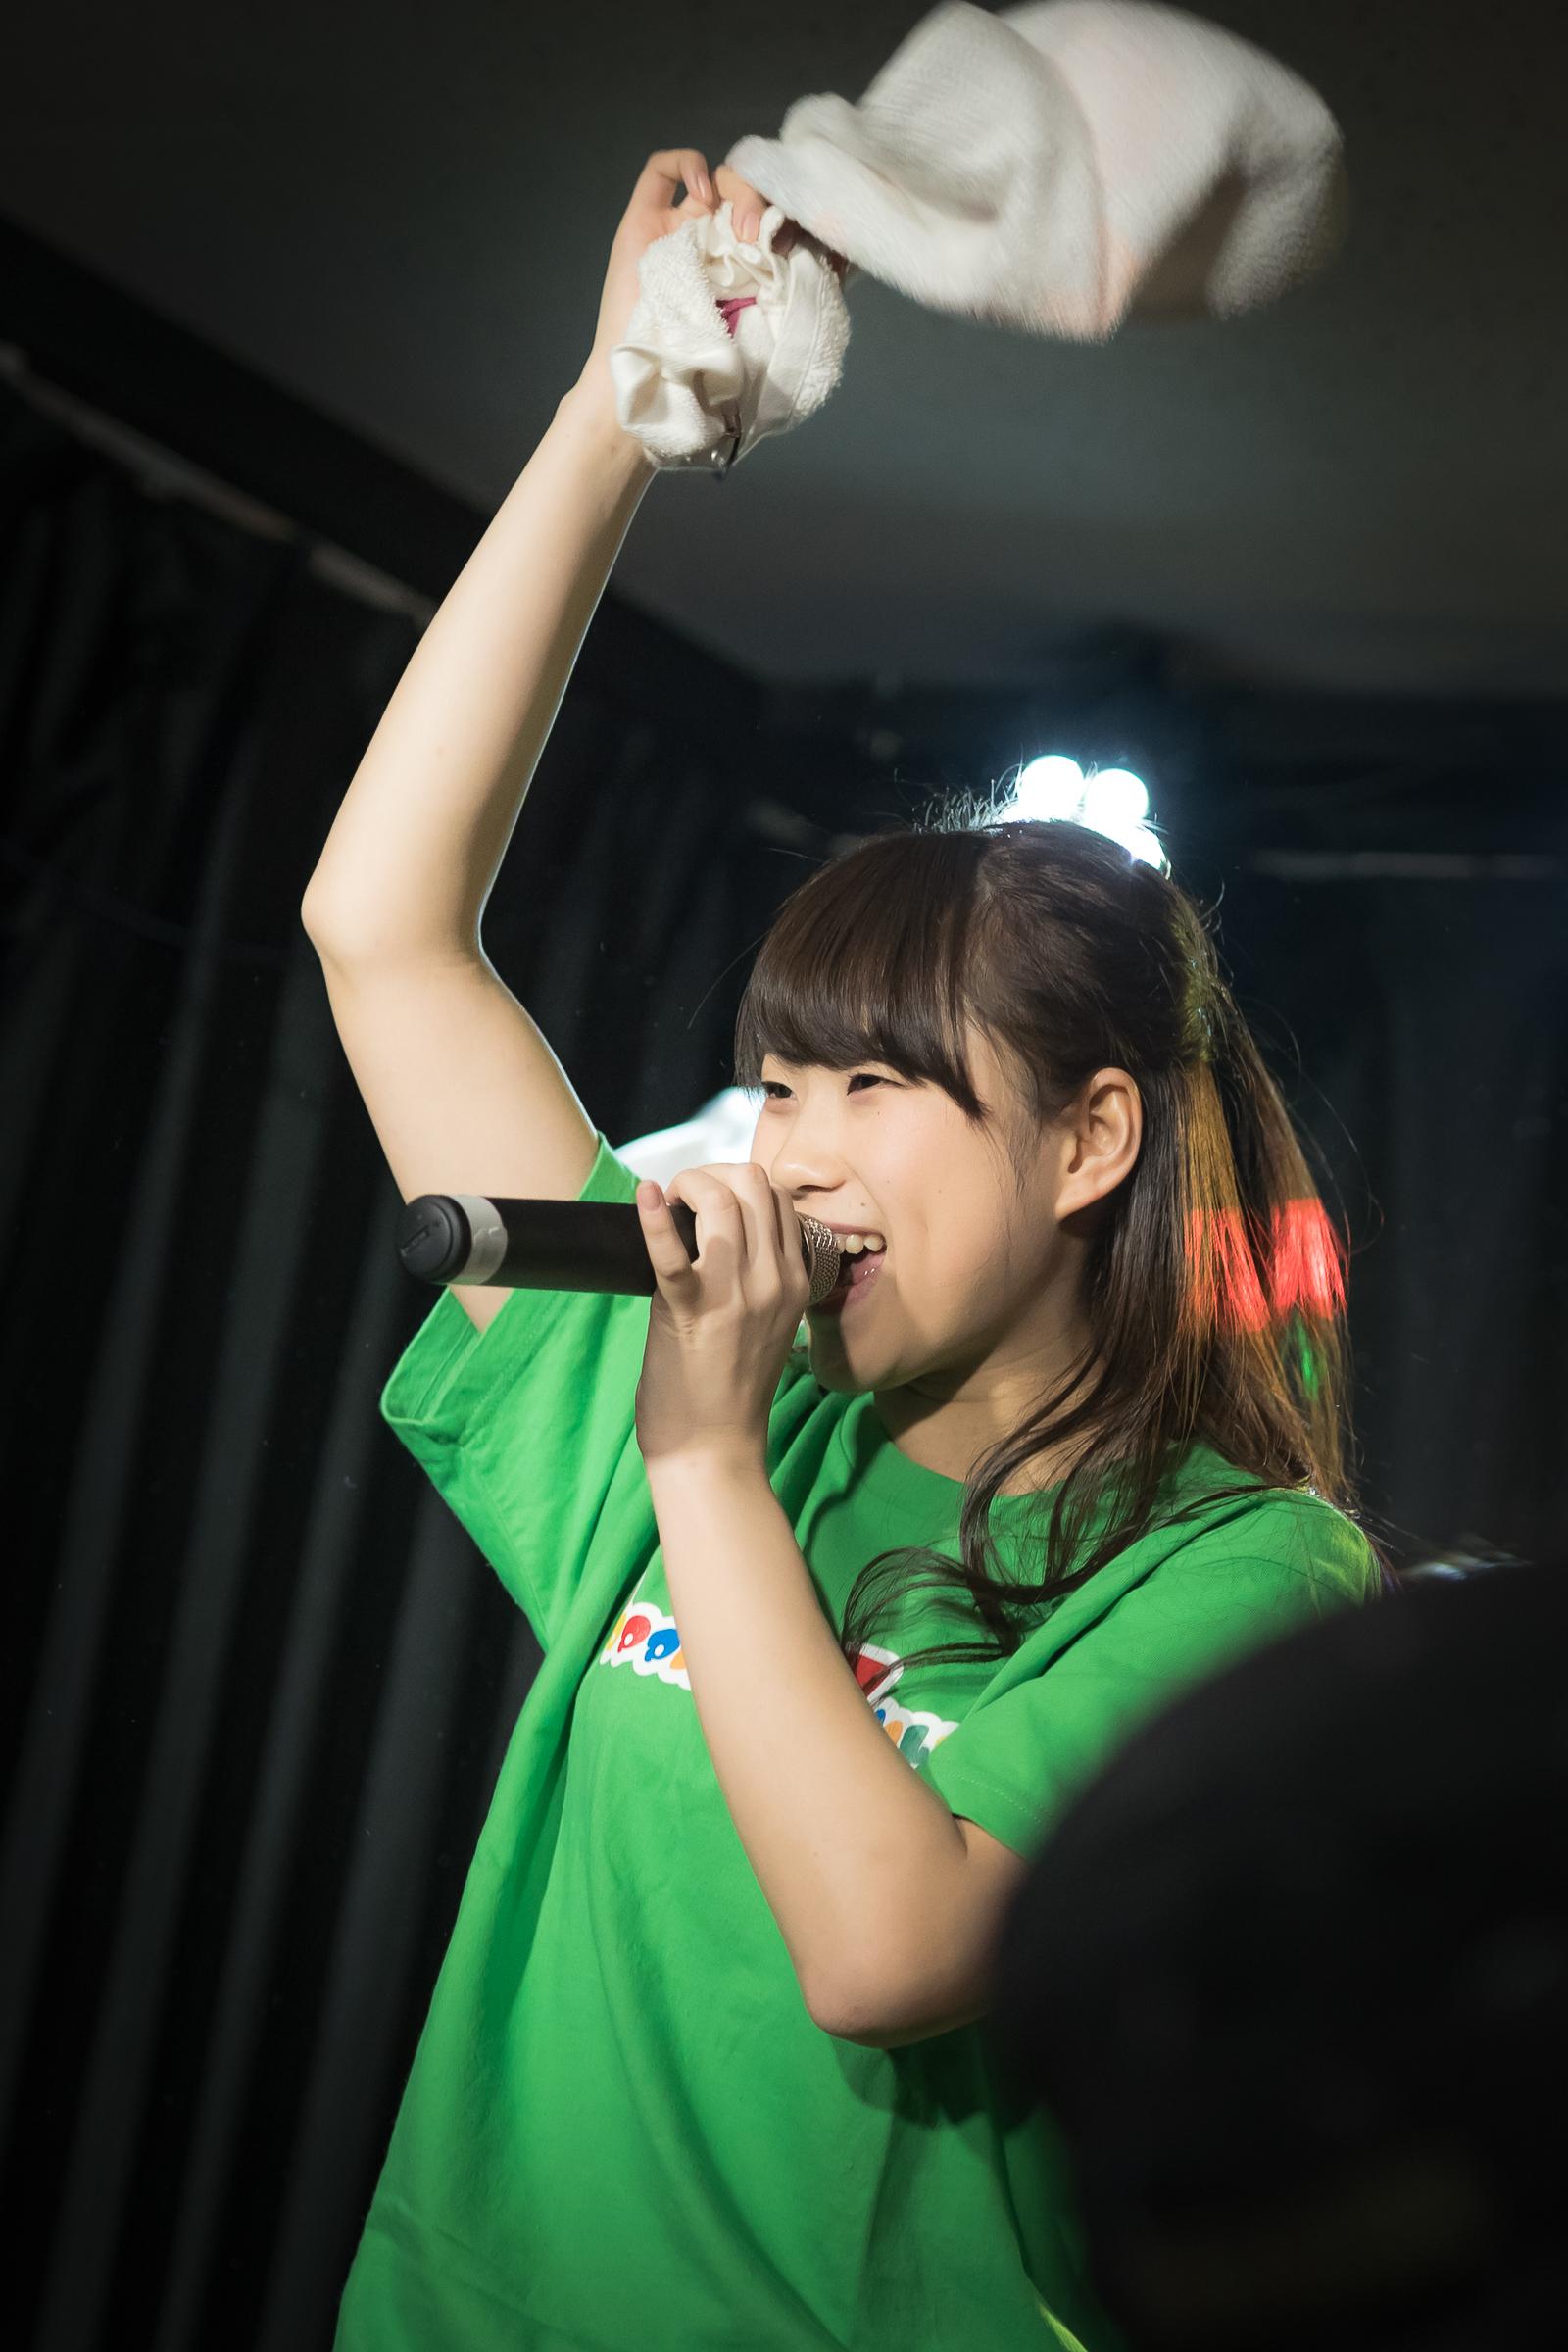 POPPING☆SMILE あすか ( 橋本明日香 ) | イベントお疲れ様でした!イベント